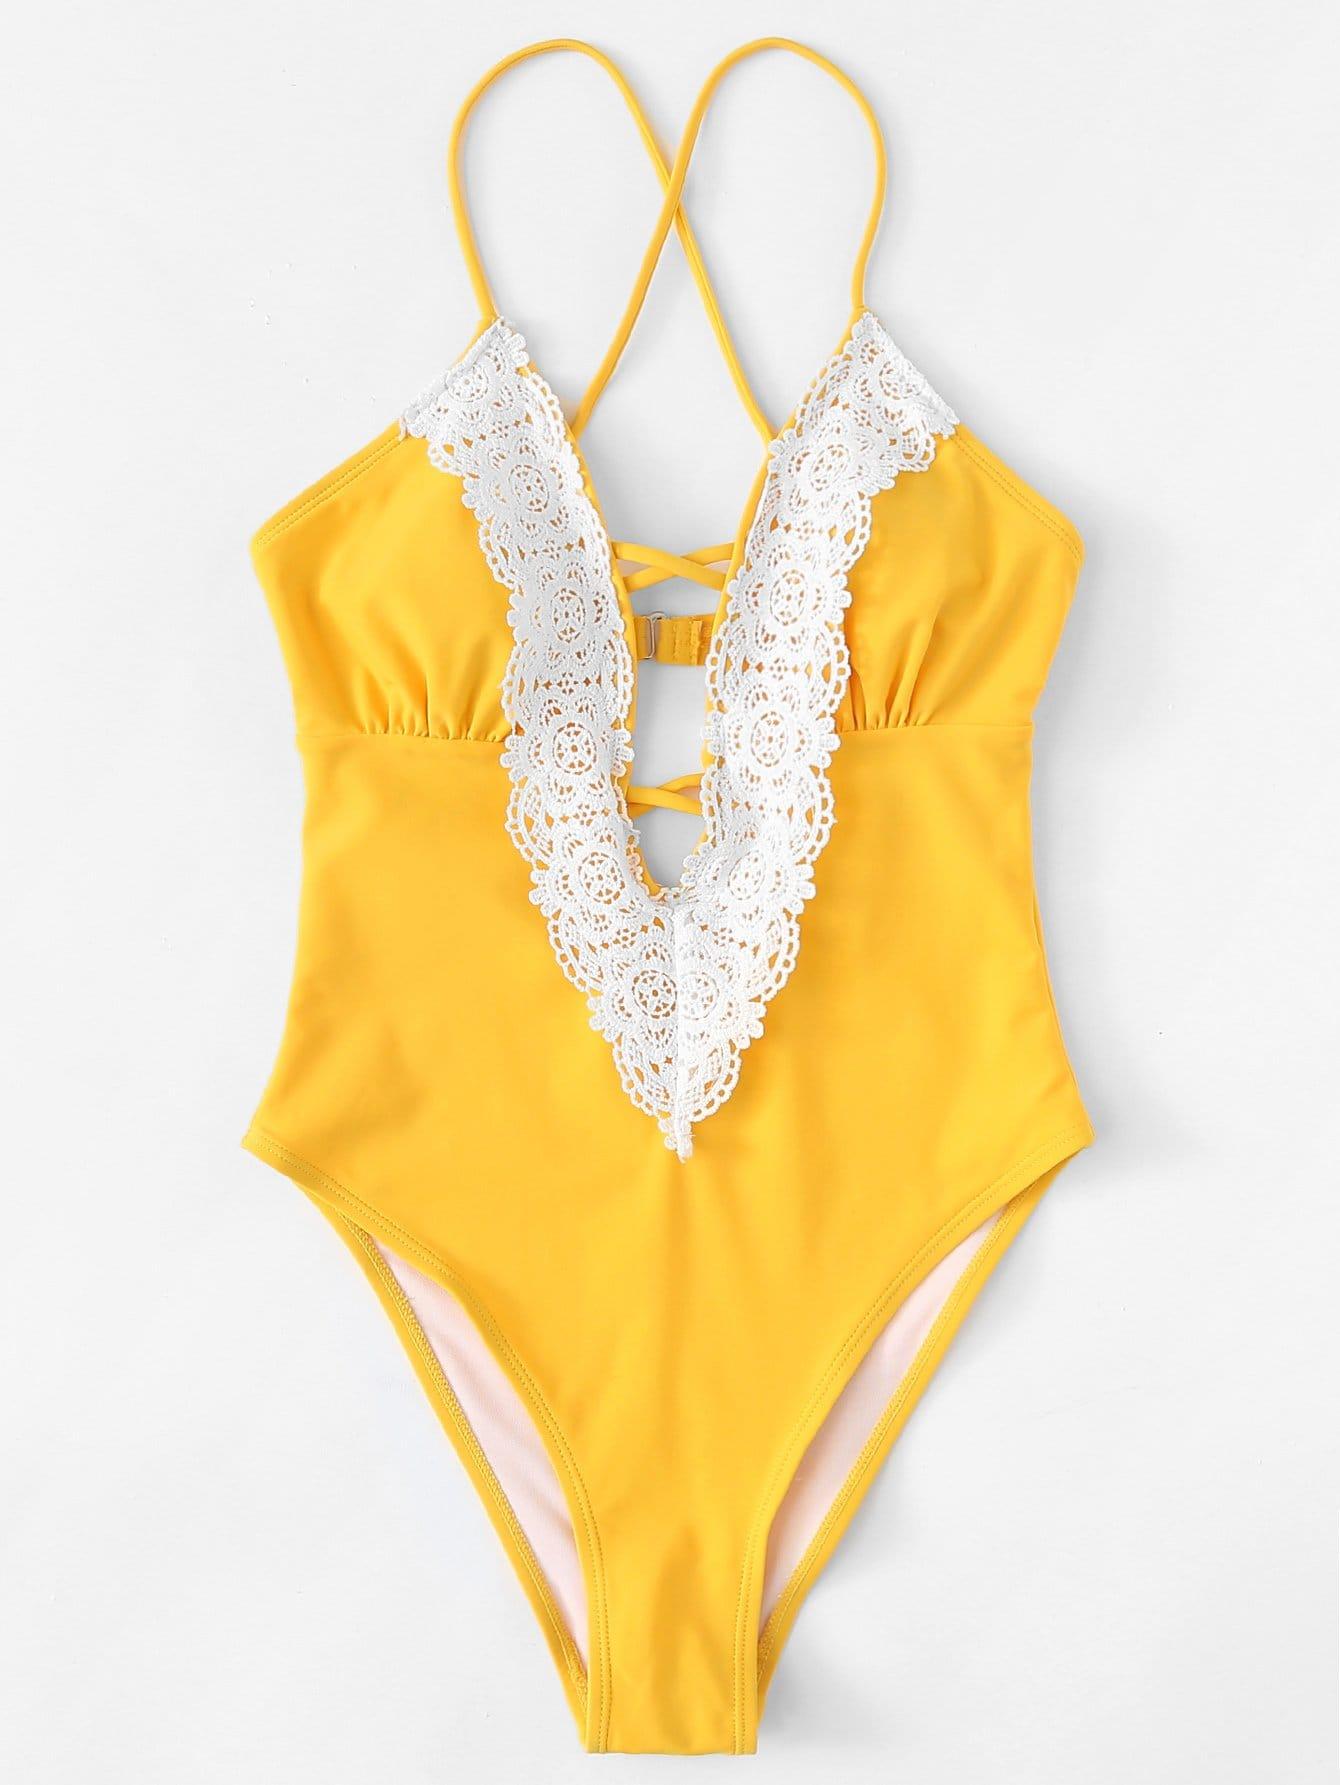 Crochet Lace Criss Cross Swimsuit